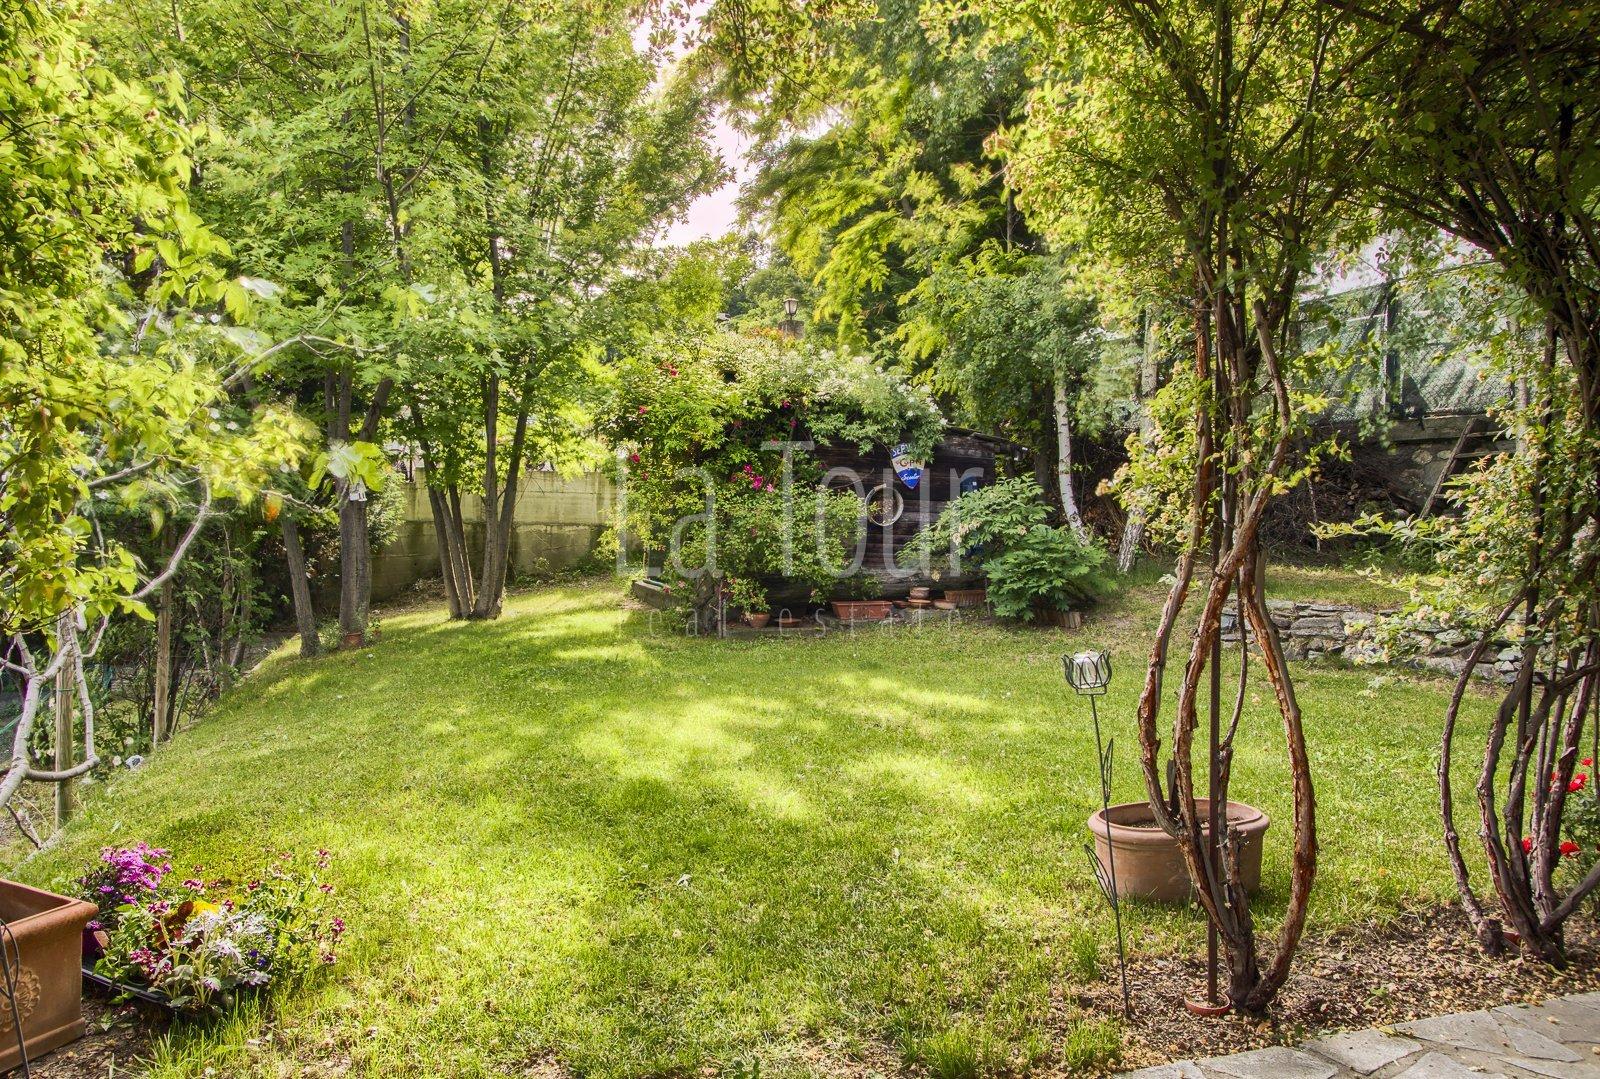 giardino lato Ovest